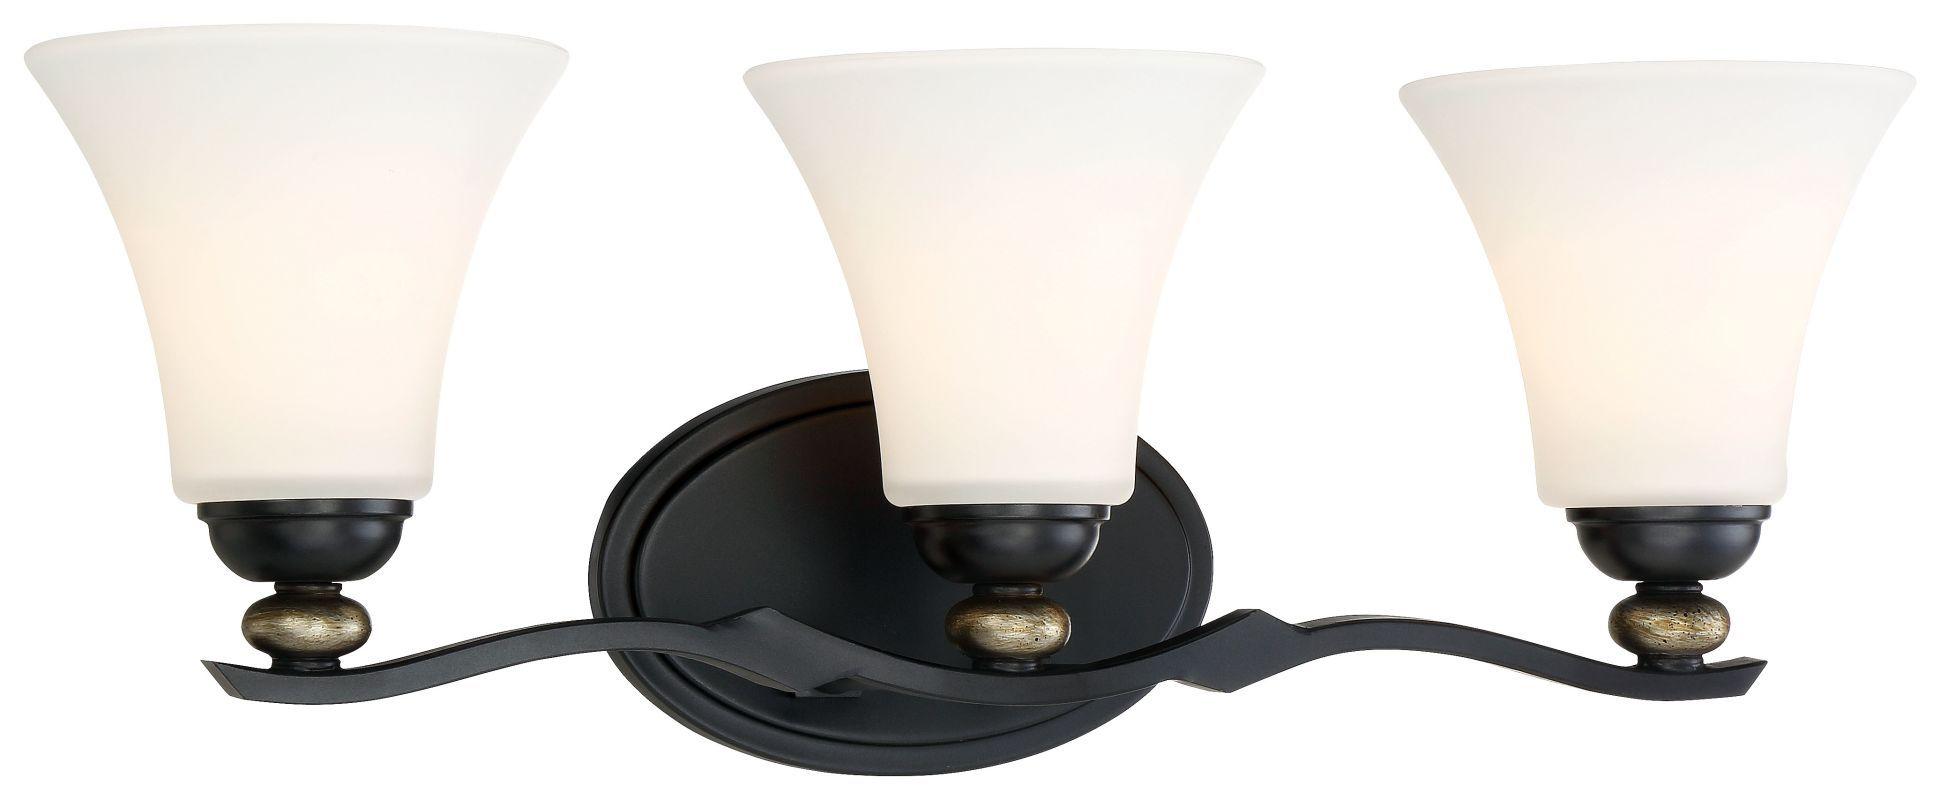 Minka Lavery 2283 589 3 Light Vanity Light from The Shadowglen